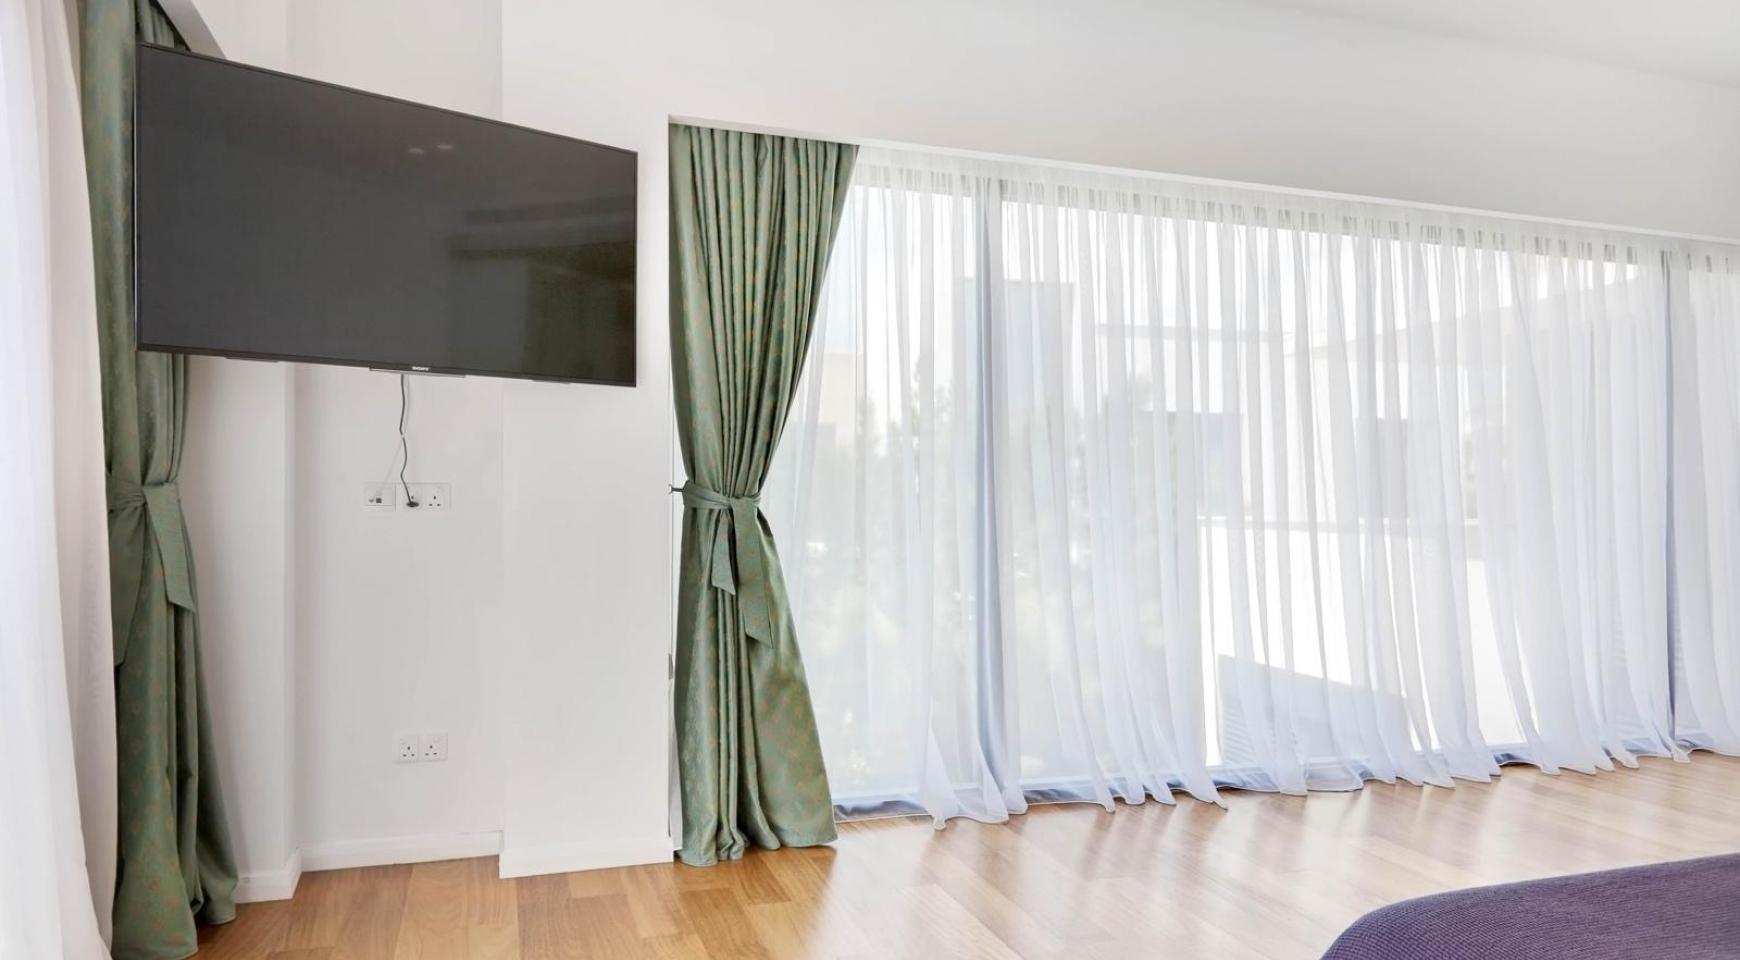 New Luxurious 4 Bedroom Villa in the Tourist Area - 30